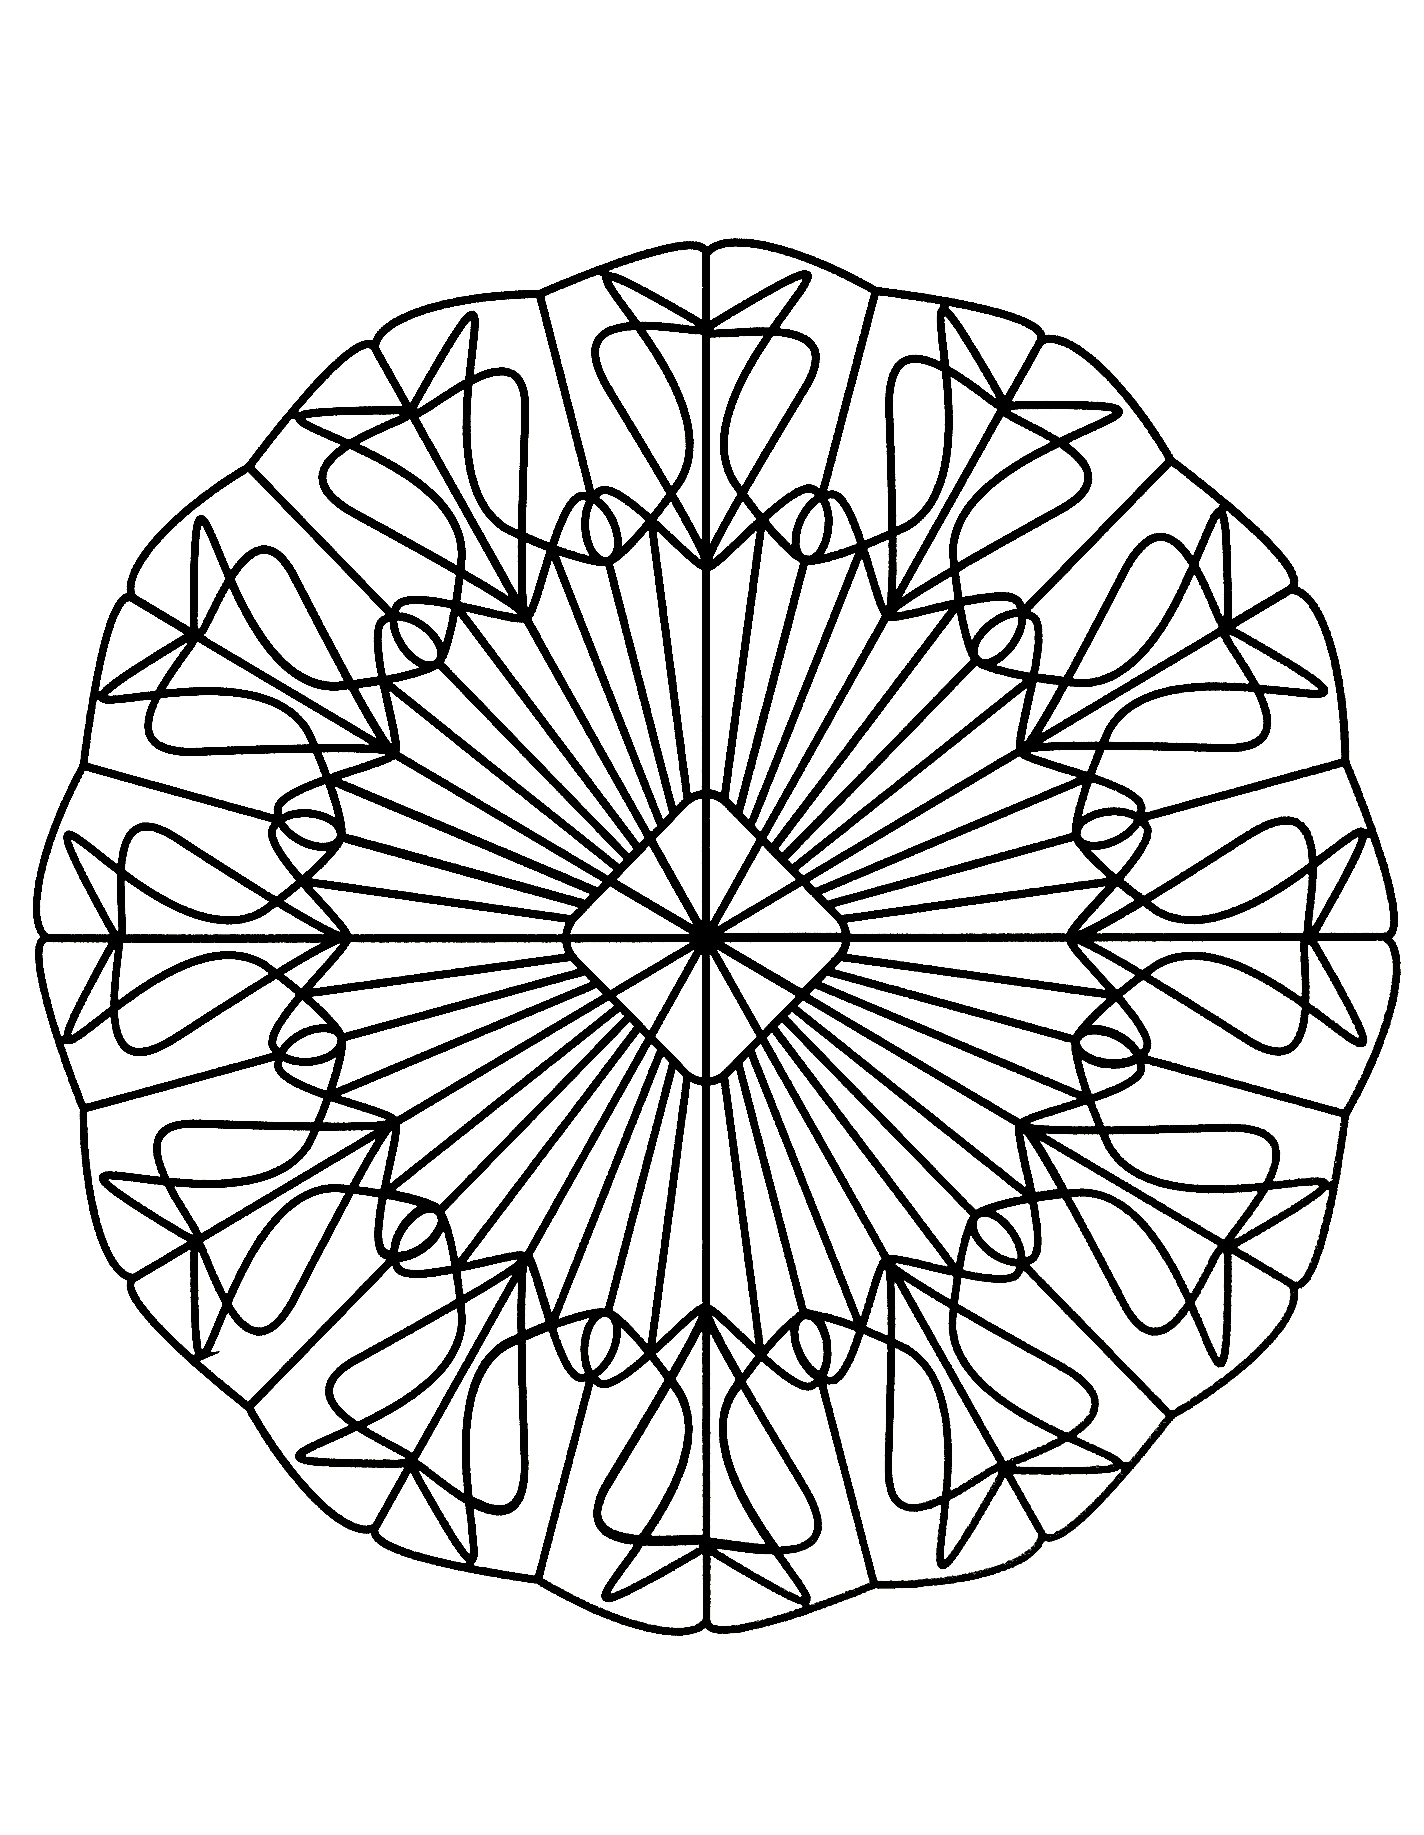 Mandala to download 47